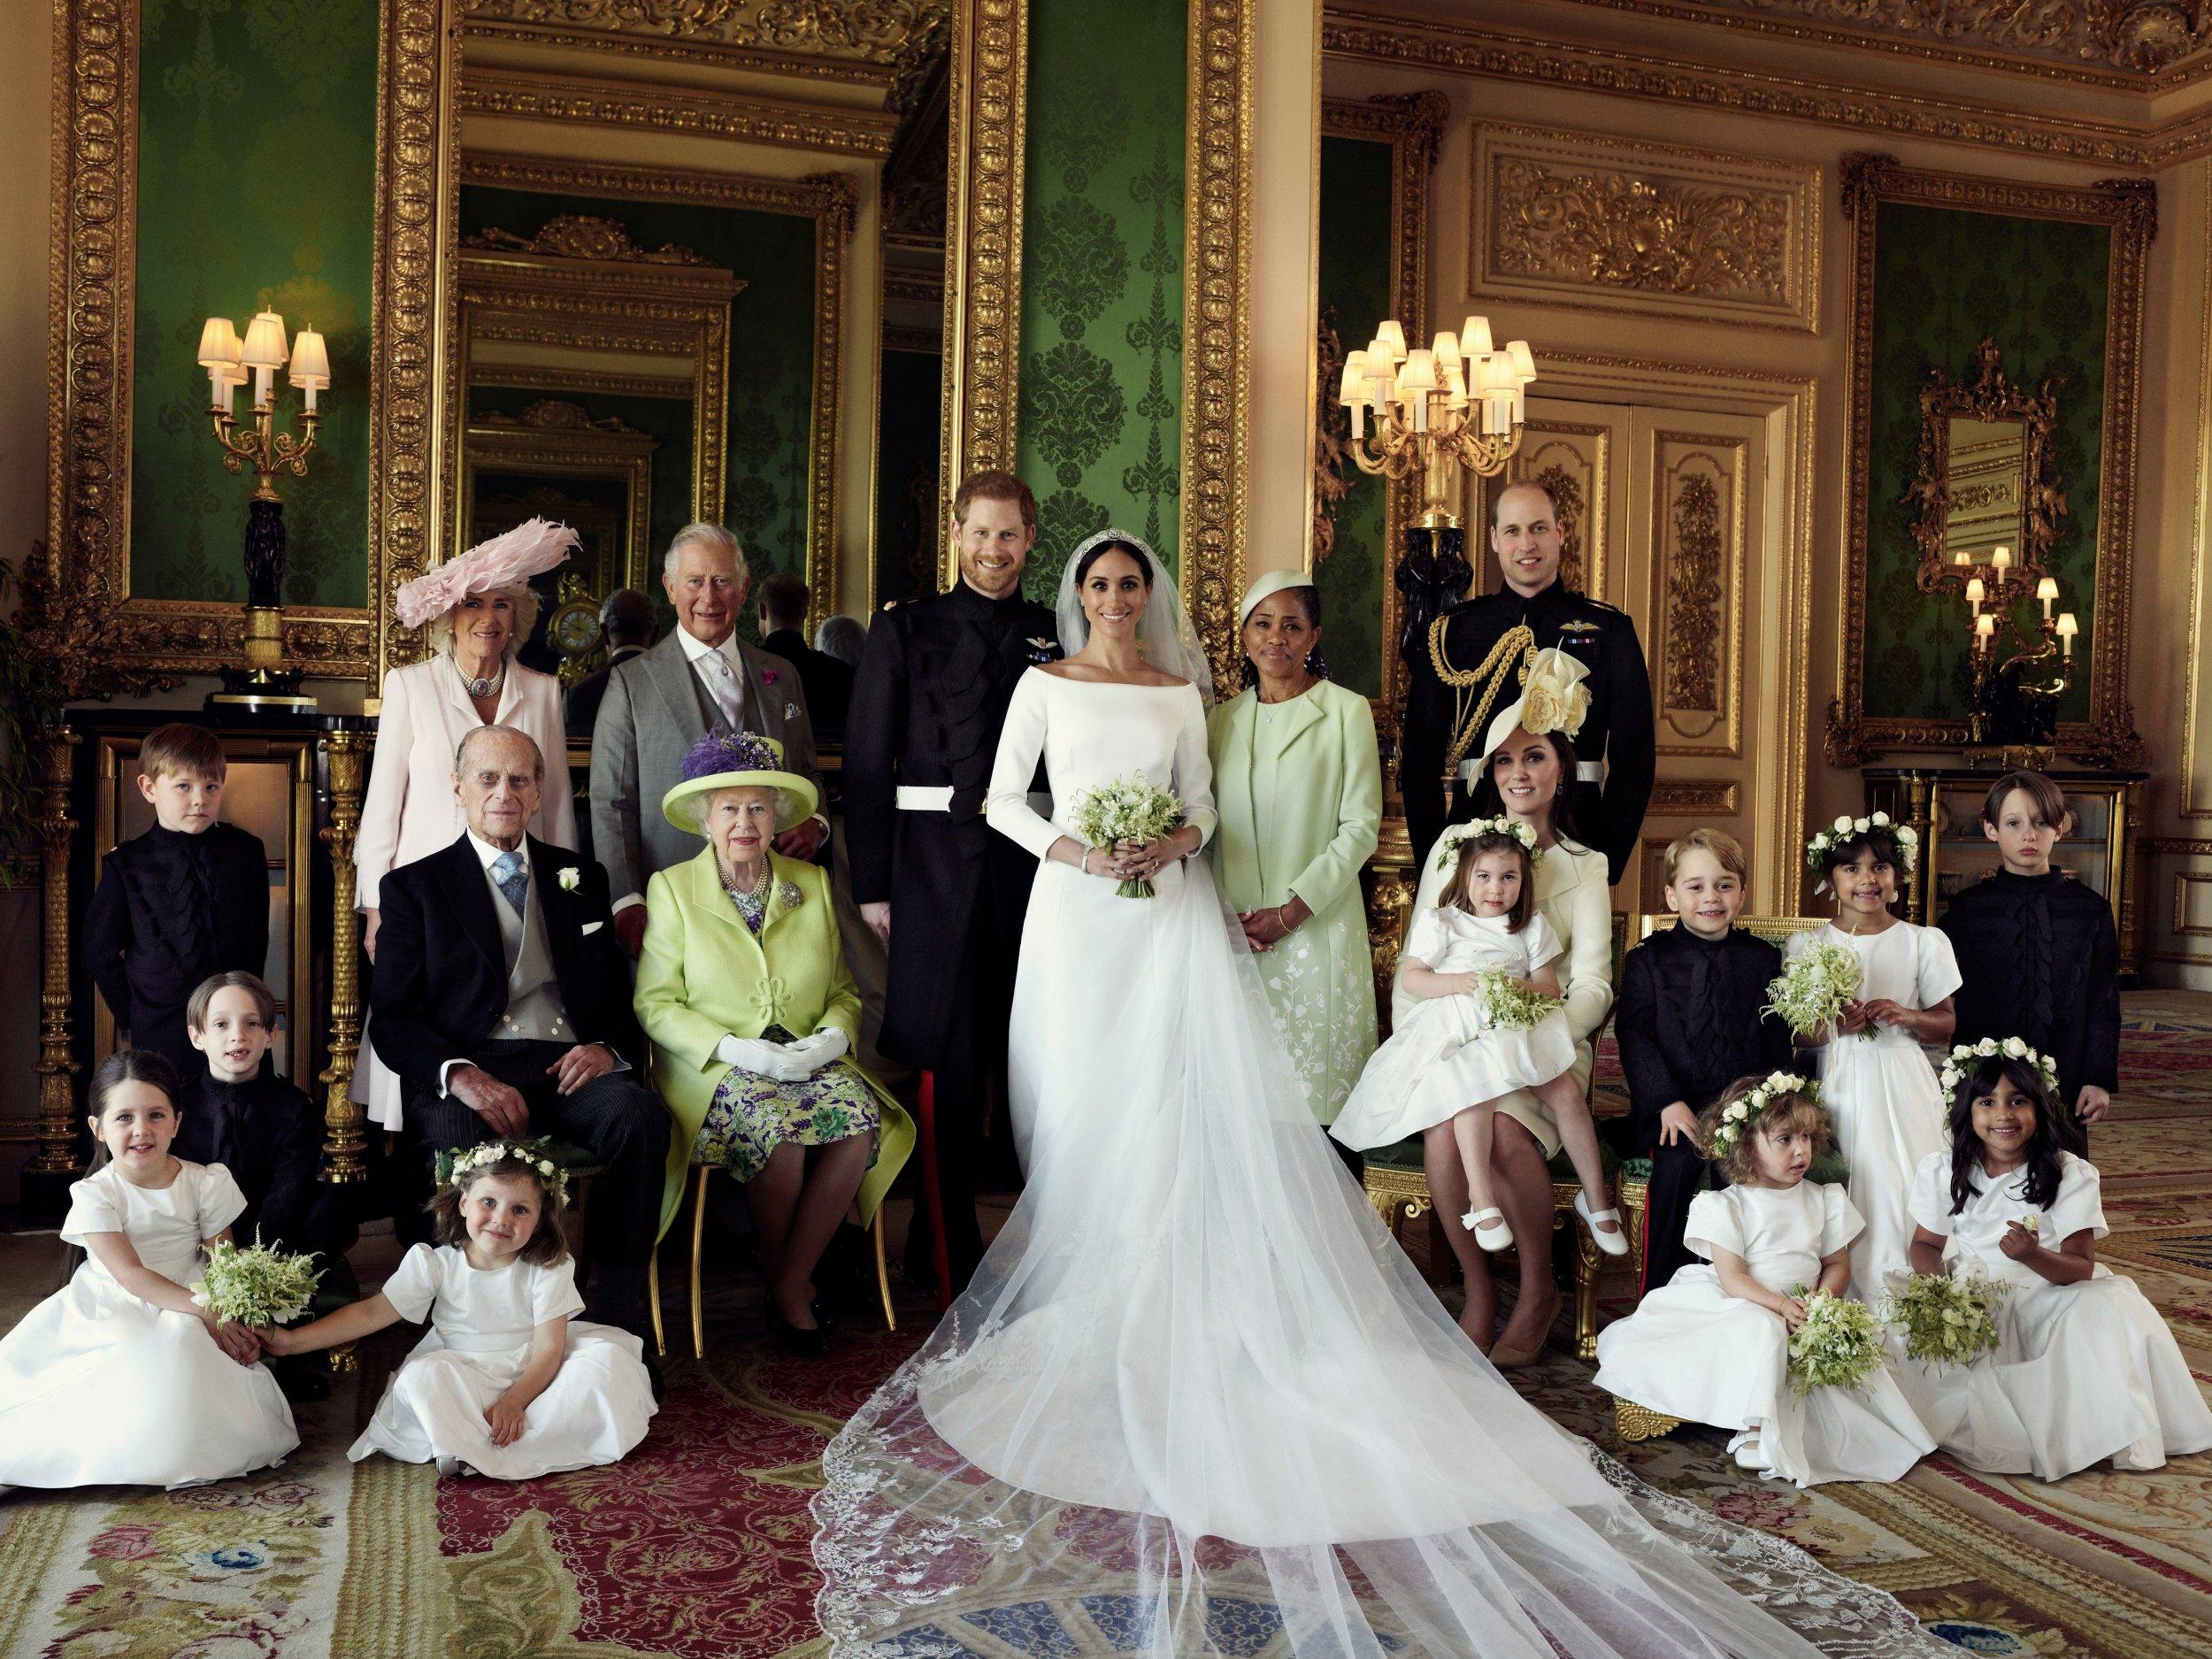 Real Weddings Zola: How To Buy Meghan Markle's Royal Wedding Dress